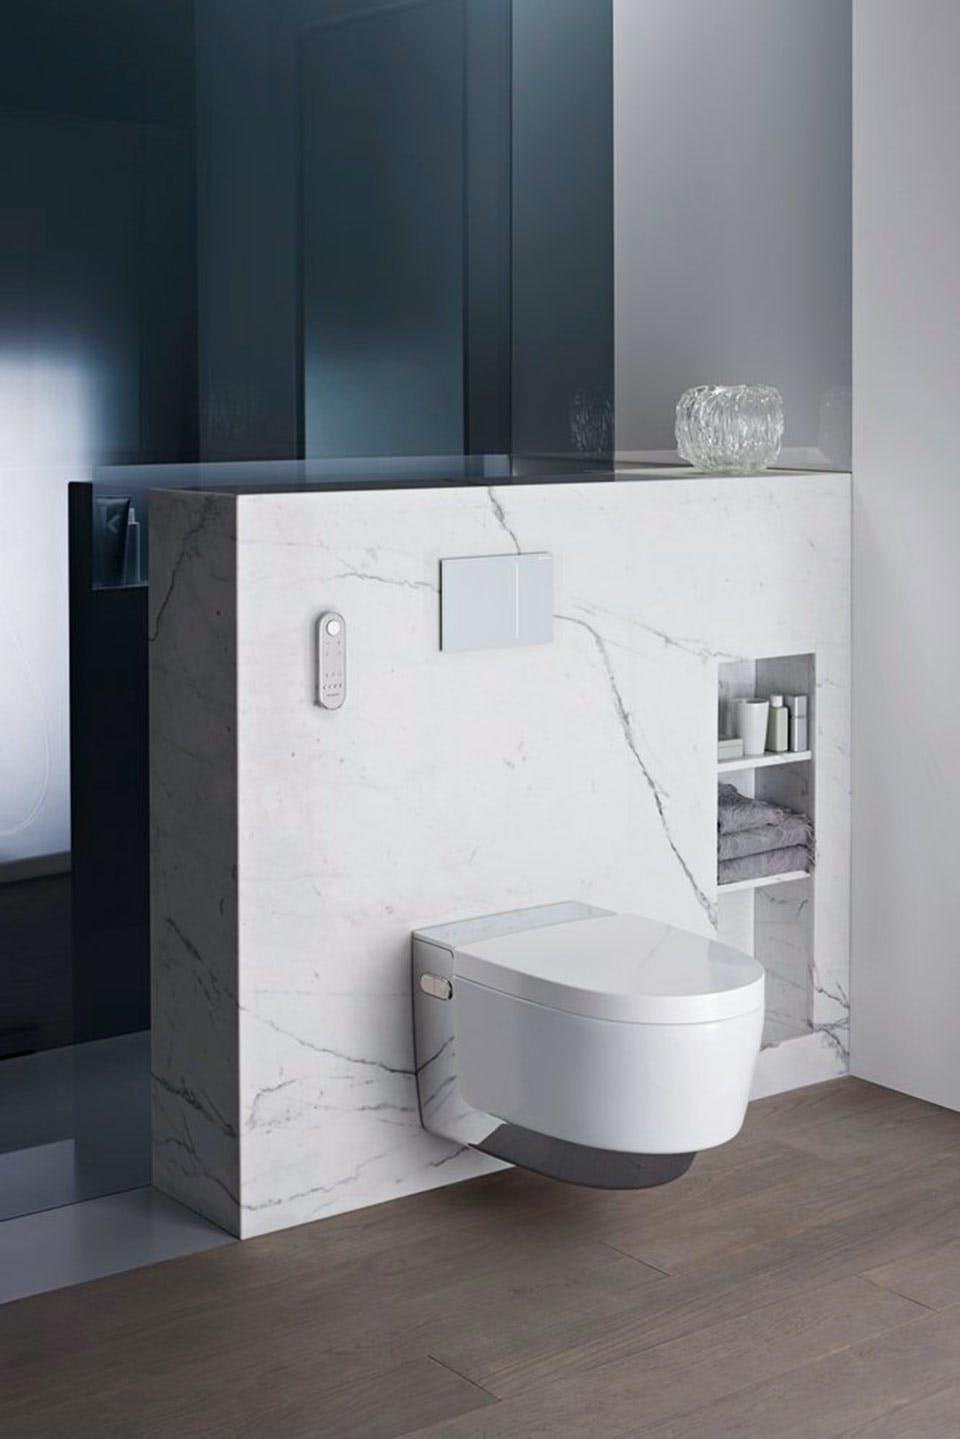 douchetoilet geberit aquaclean mera toilet i gennemført design til badeværelset